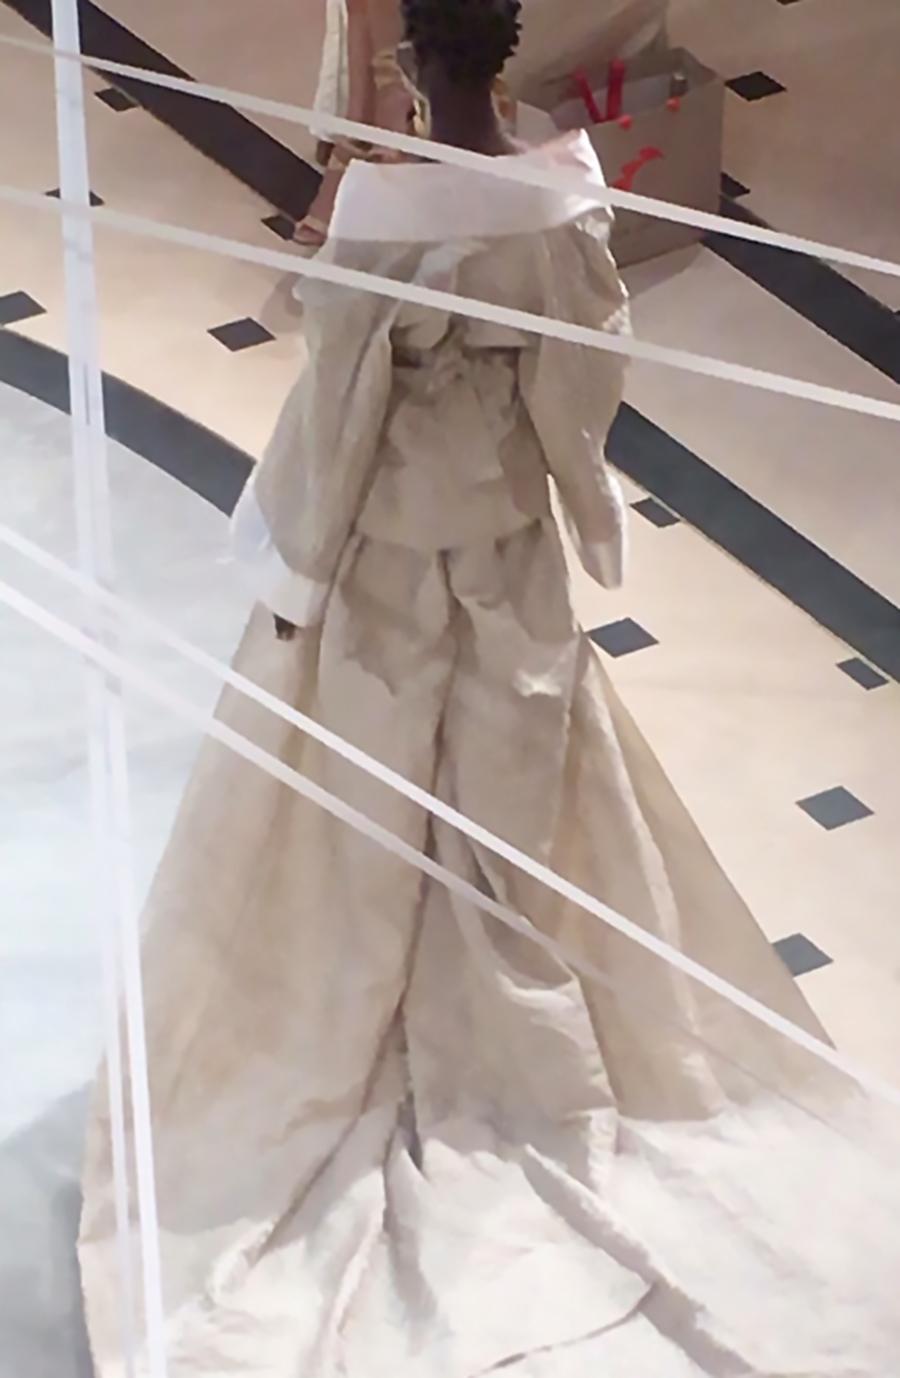 Just-take-a-look Berlin - Two Fashion Days - Anja Gockel - Asuka 8